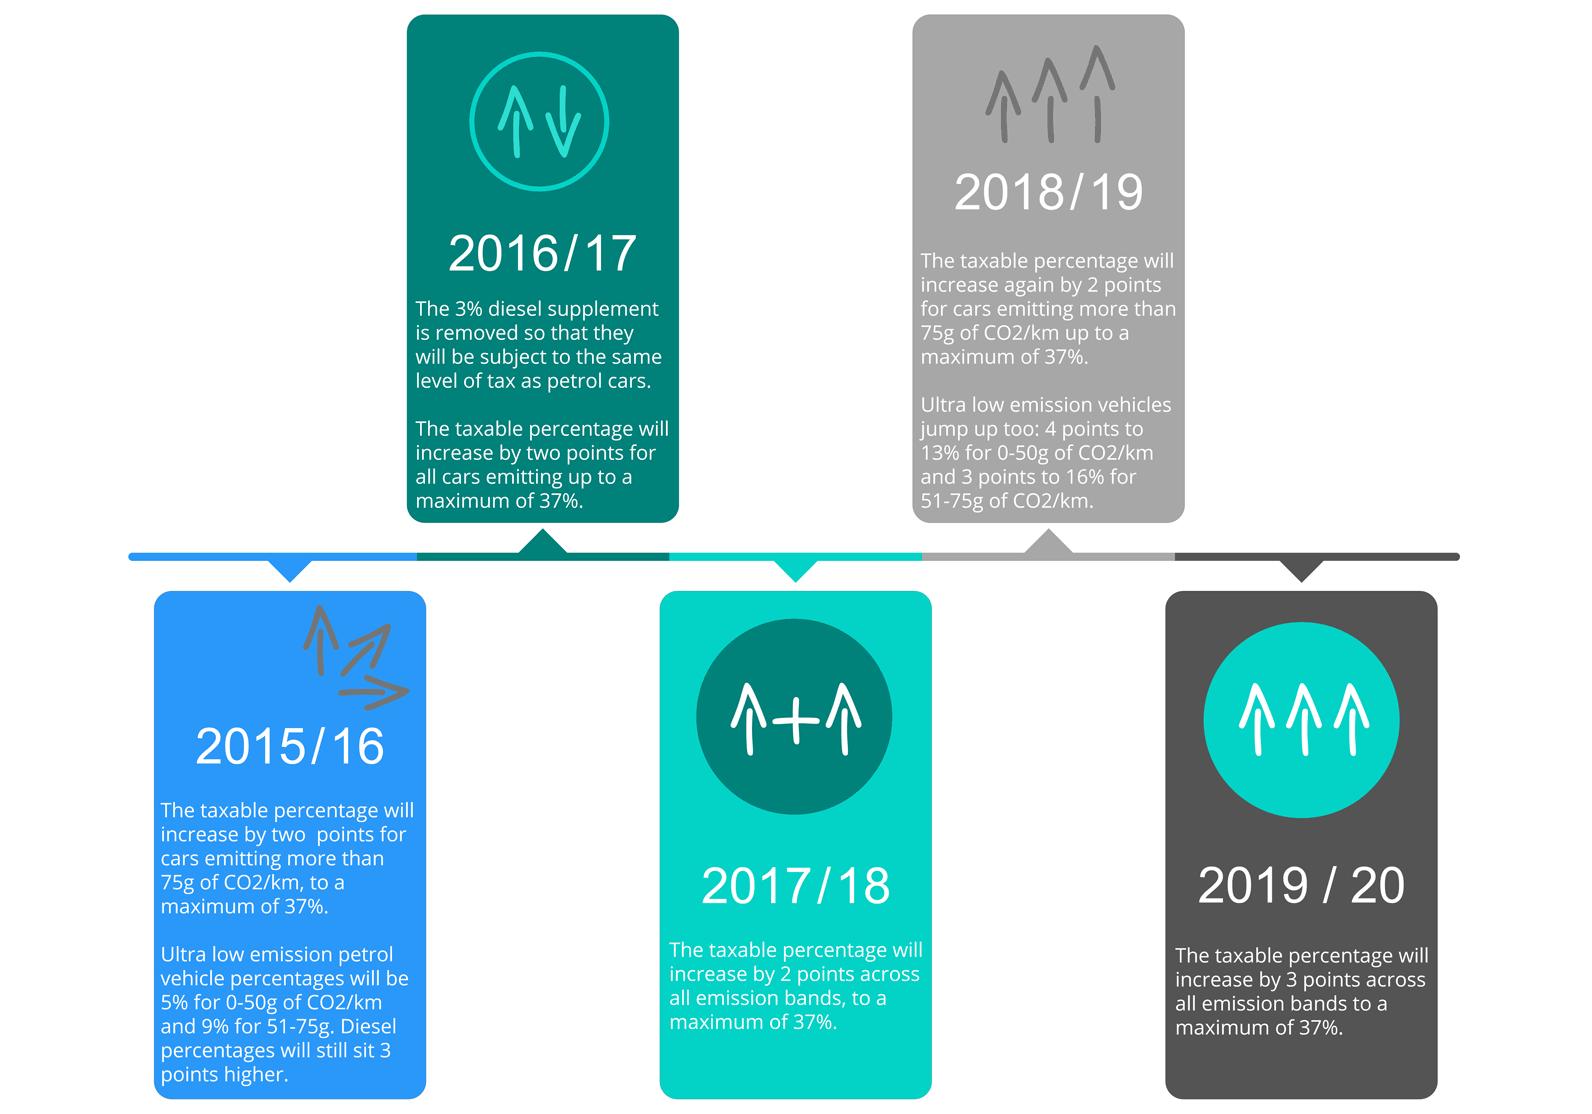 Budget 2015 Company Car BIK Rates 2016/17 to 2019/20 Timeline Infographic